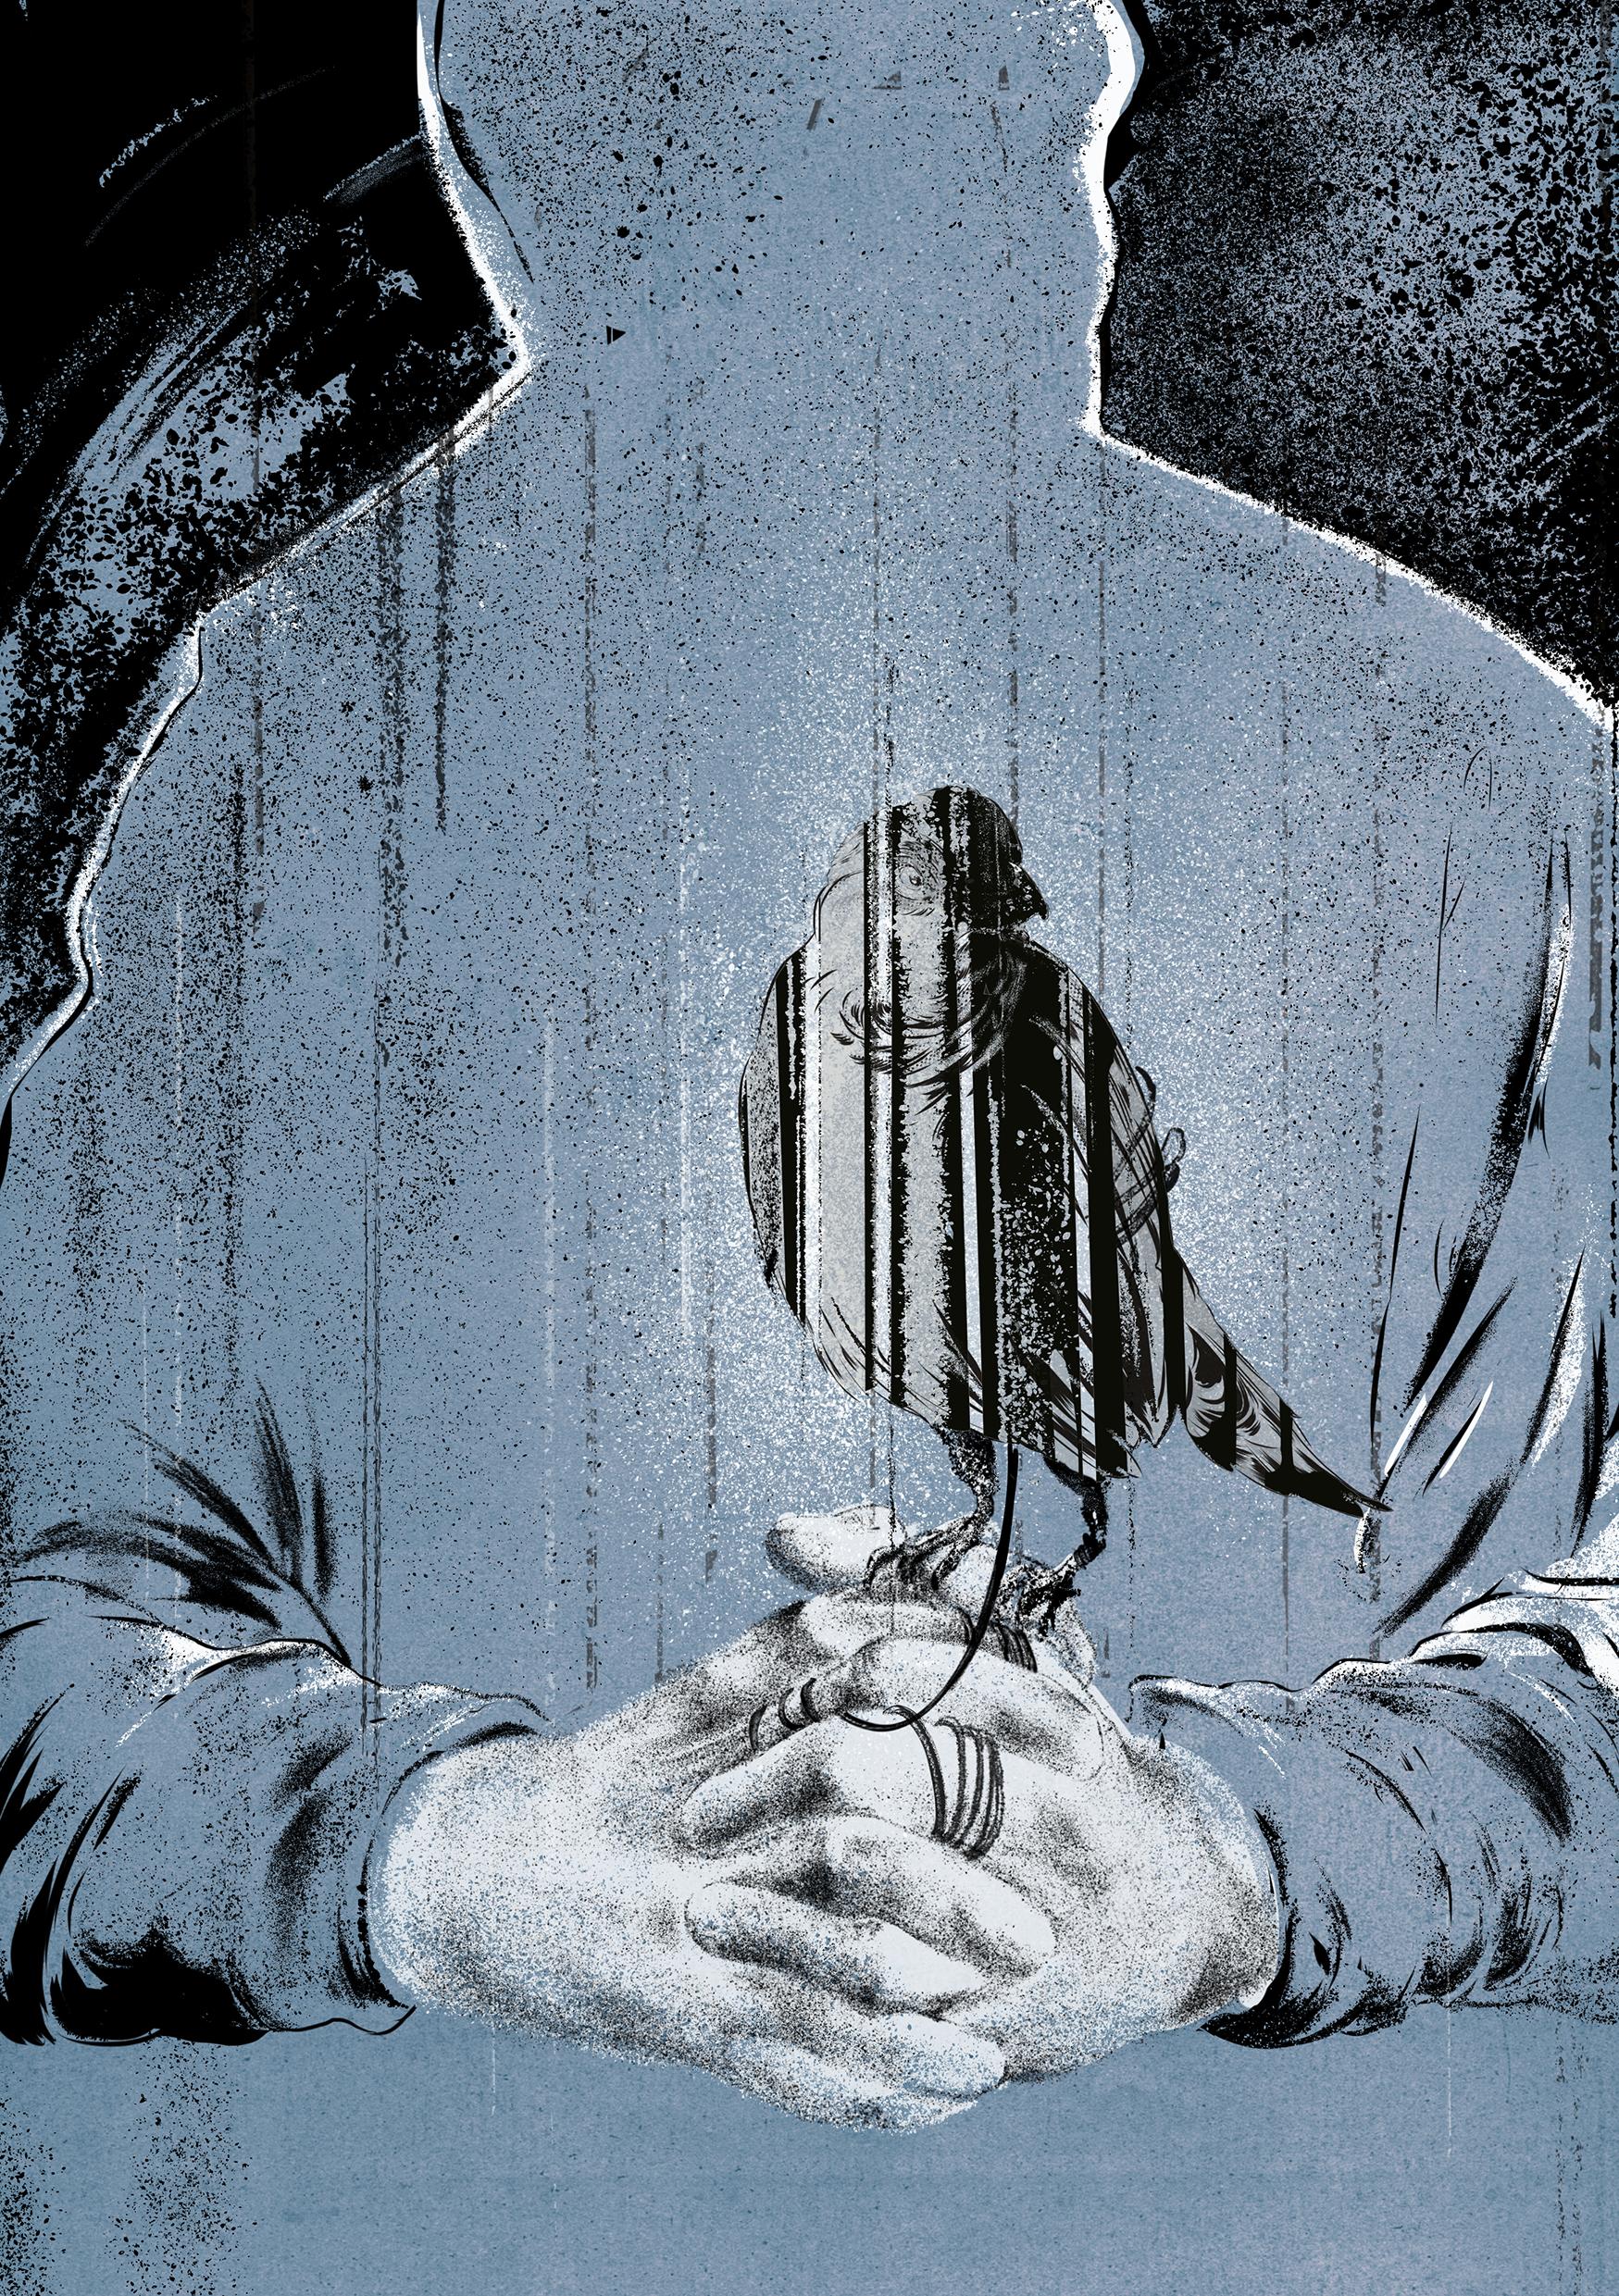 Illustration for Firewords Magazine 'Issue 9'